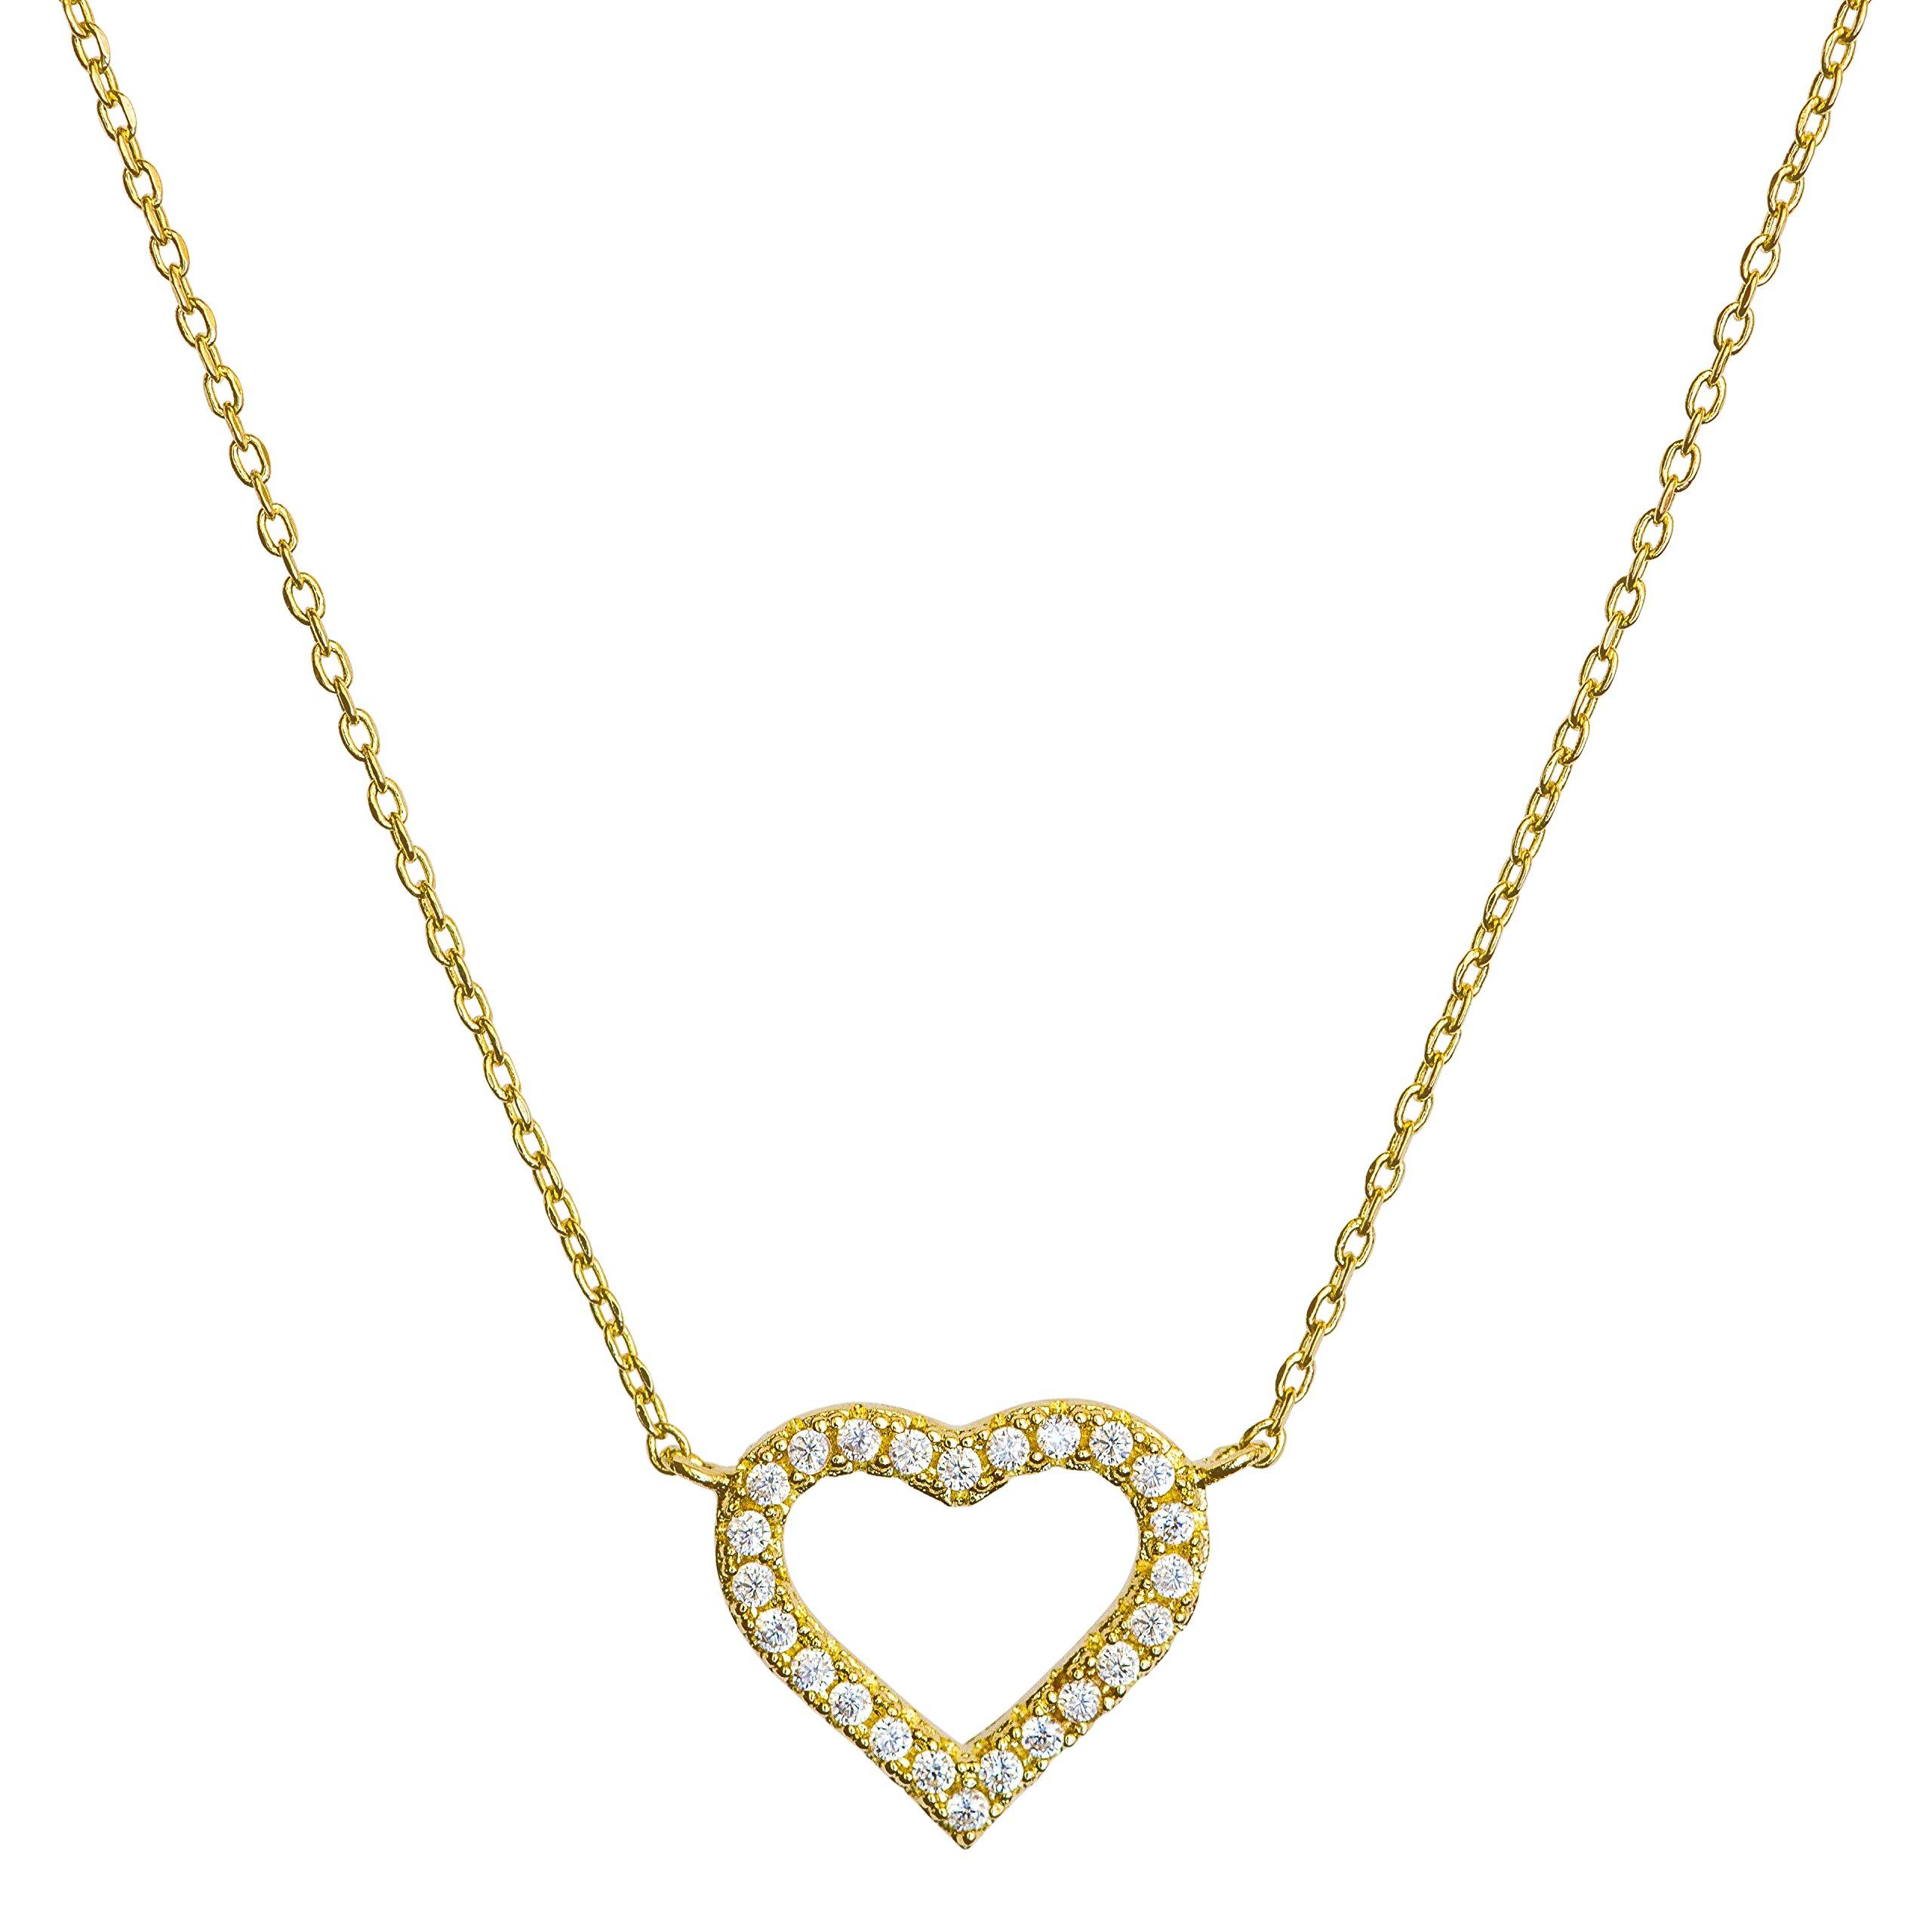 Benevolence LA Heart Necklace: Diamond Shape Cubic Zirconia Stones Jewelry for Woman Teens Girls 14k Gold Dipped Dainty